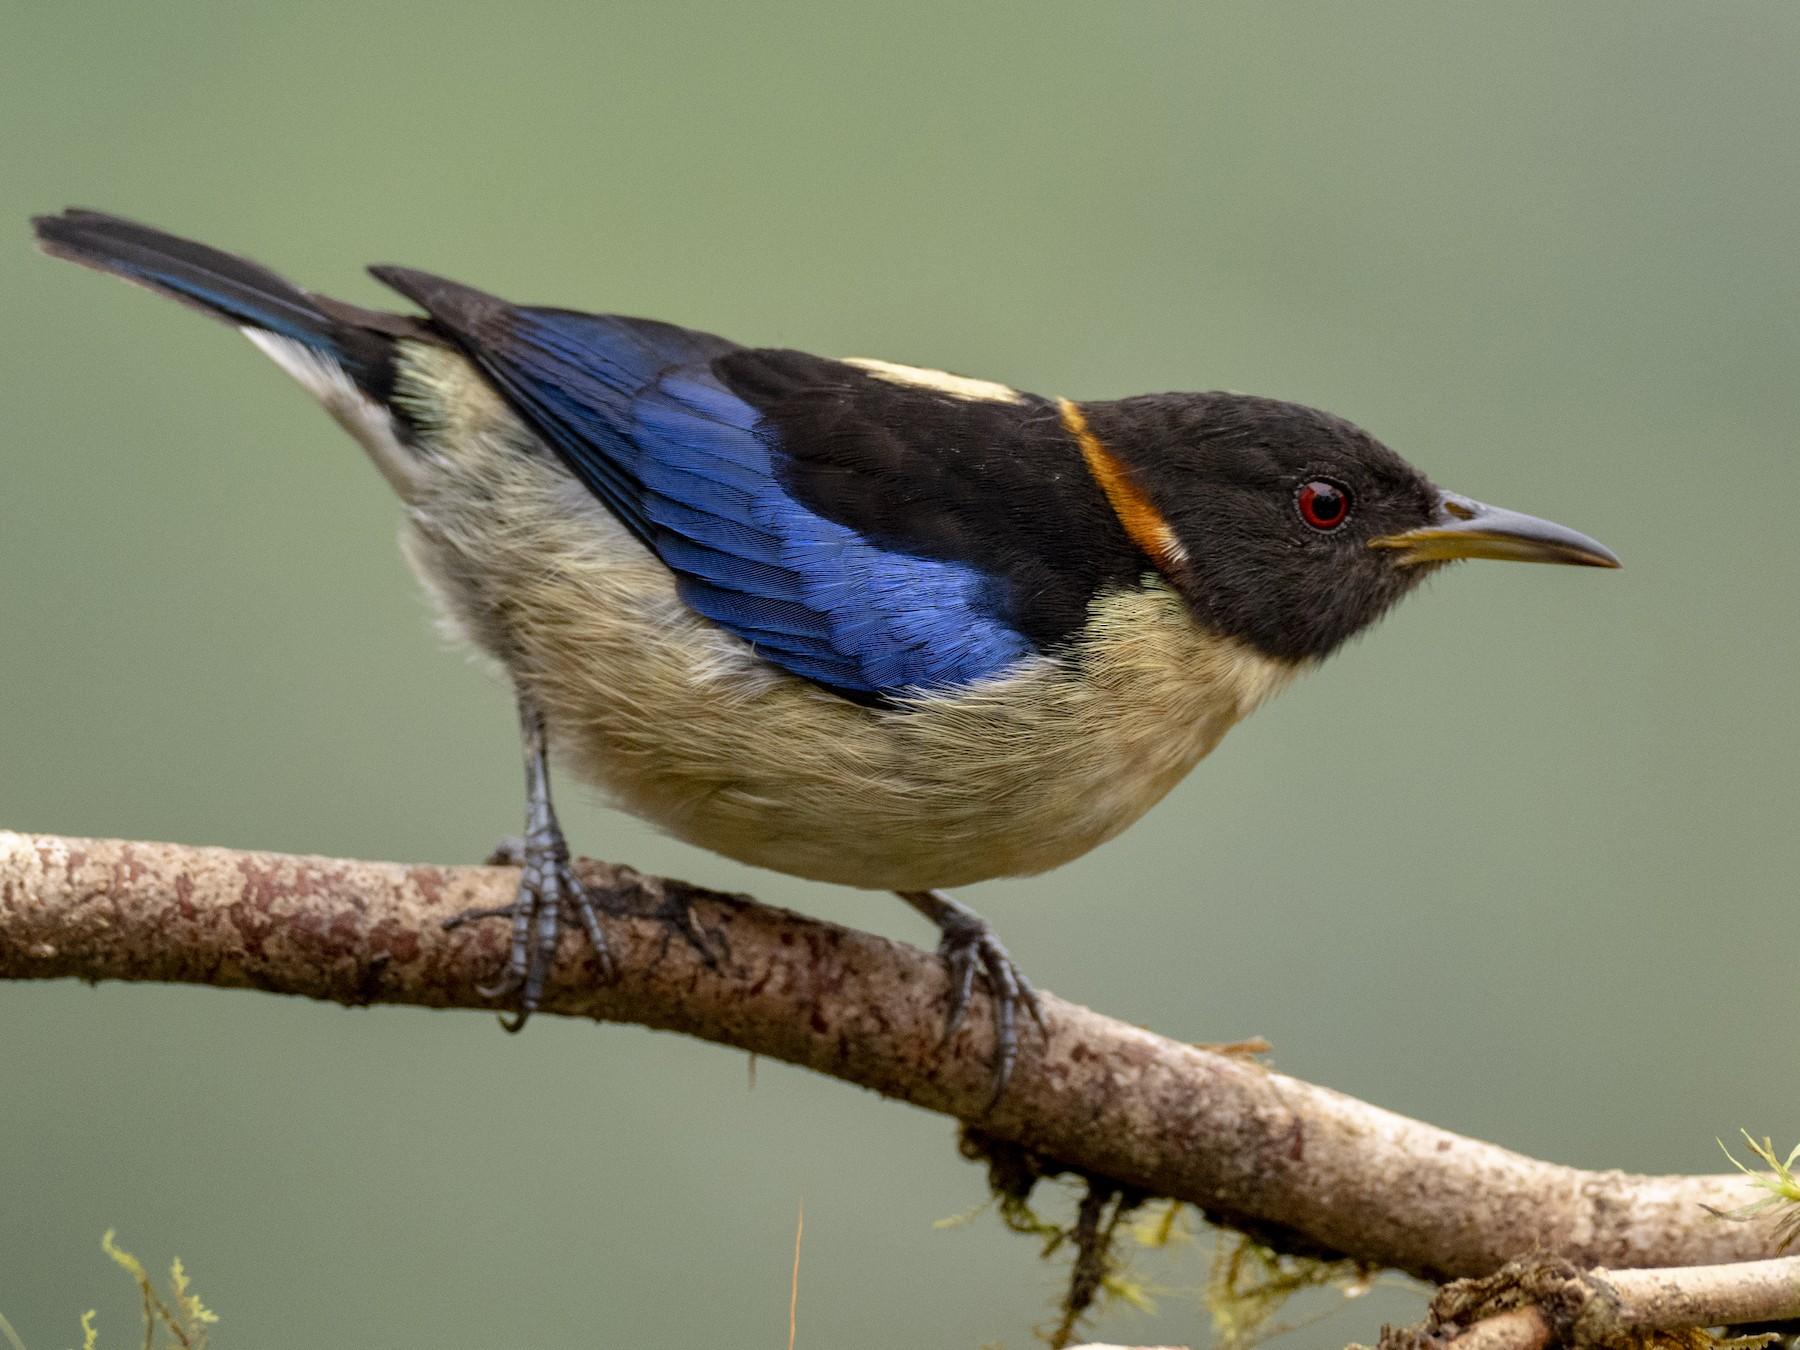 Golden-collared Honeycreeper - Andres Vasquez Noboa - Tropical Birding Tours